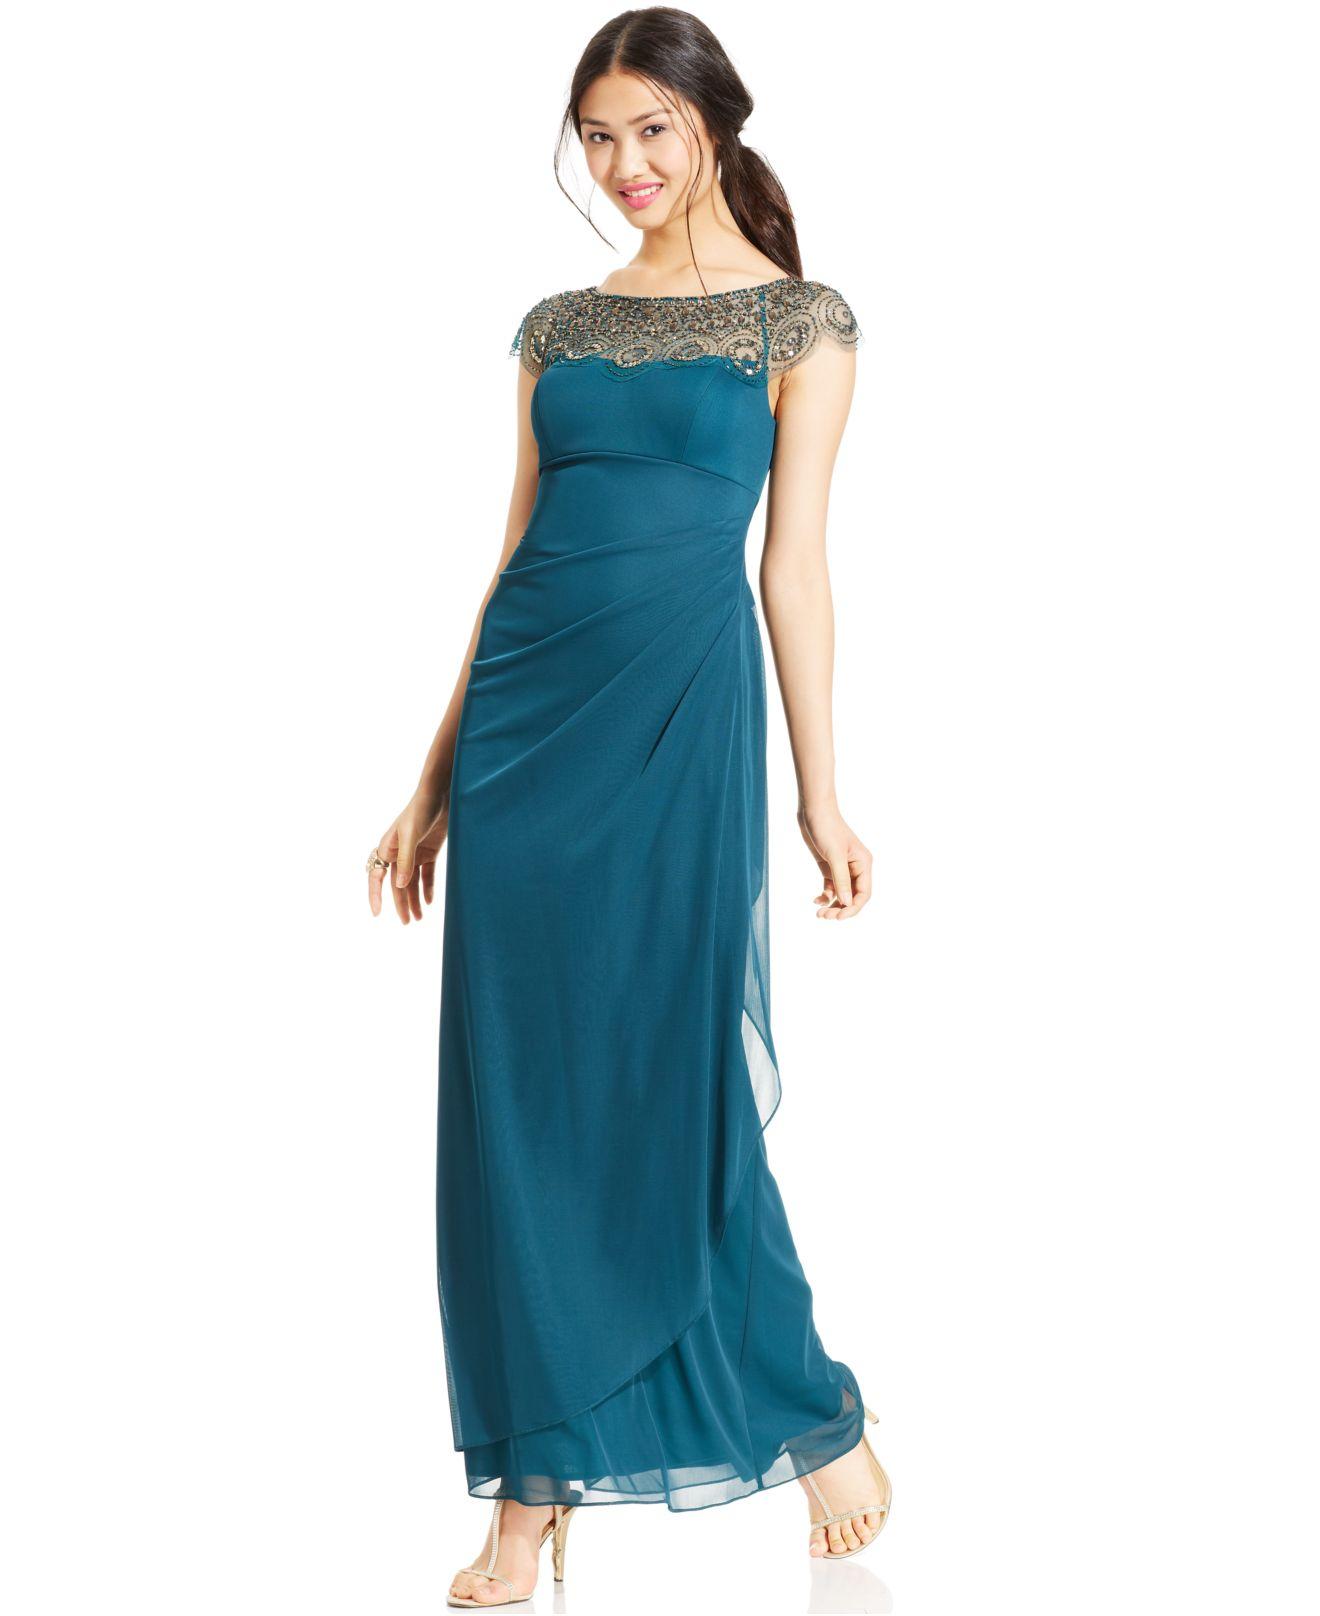 ad8e39fada1 Womens Petite Dresses Macys - Data Dynamic AG